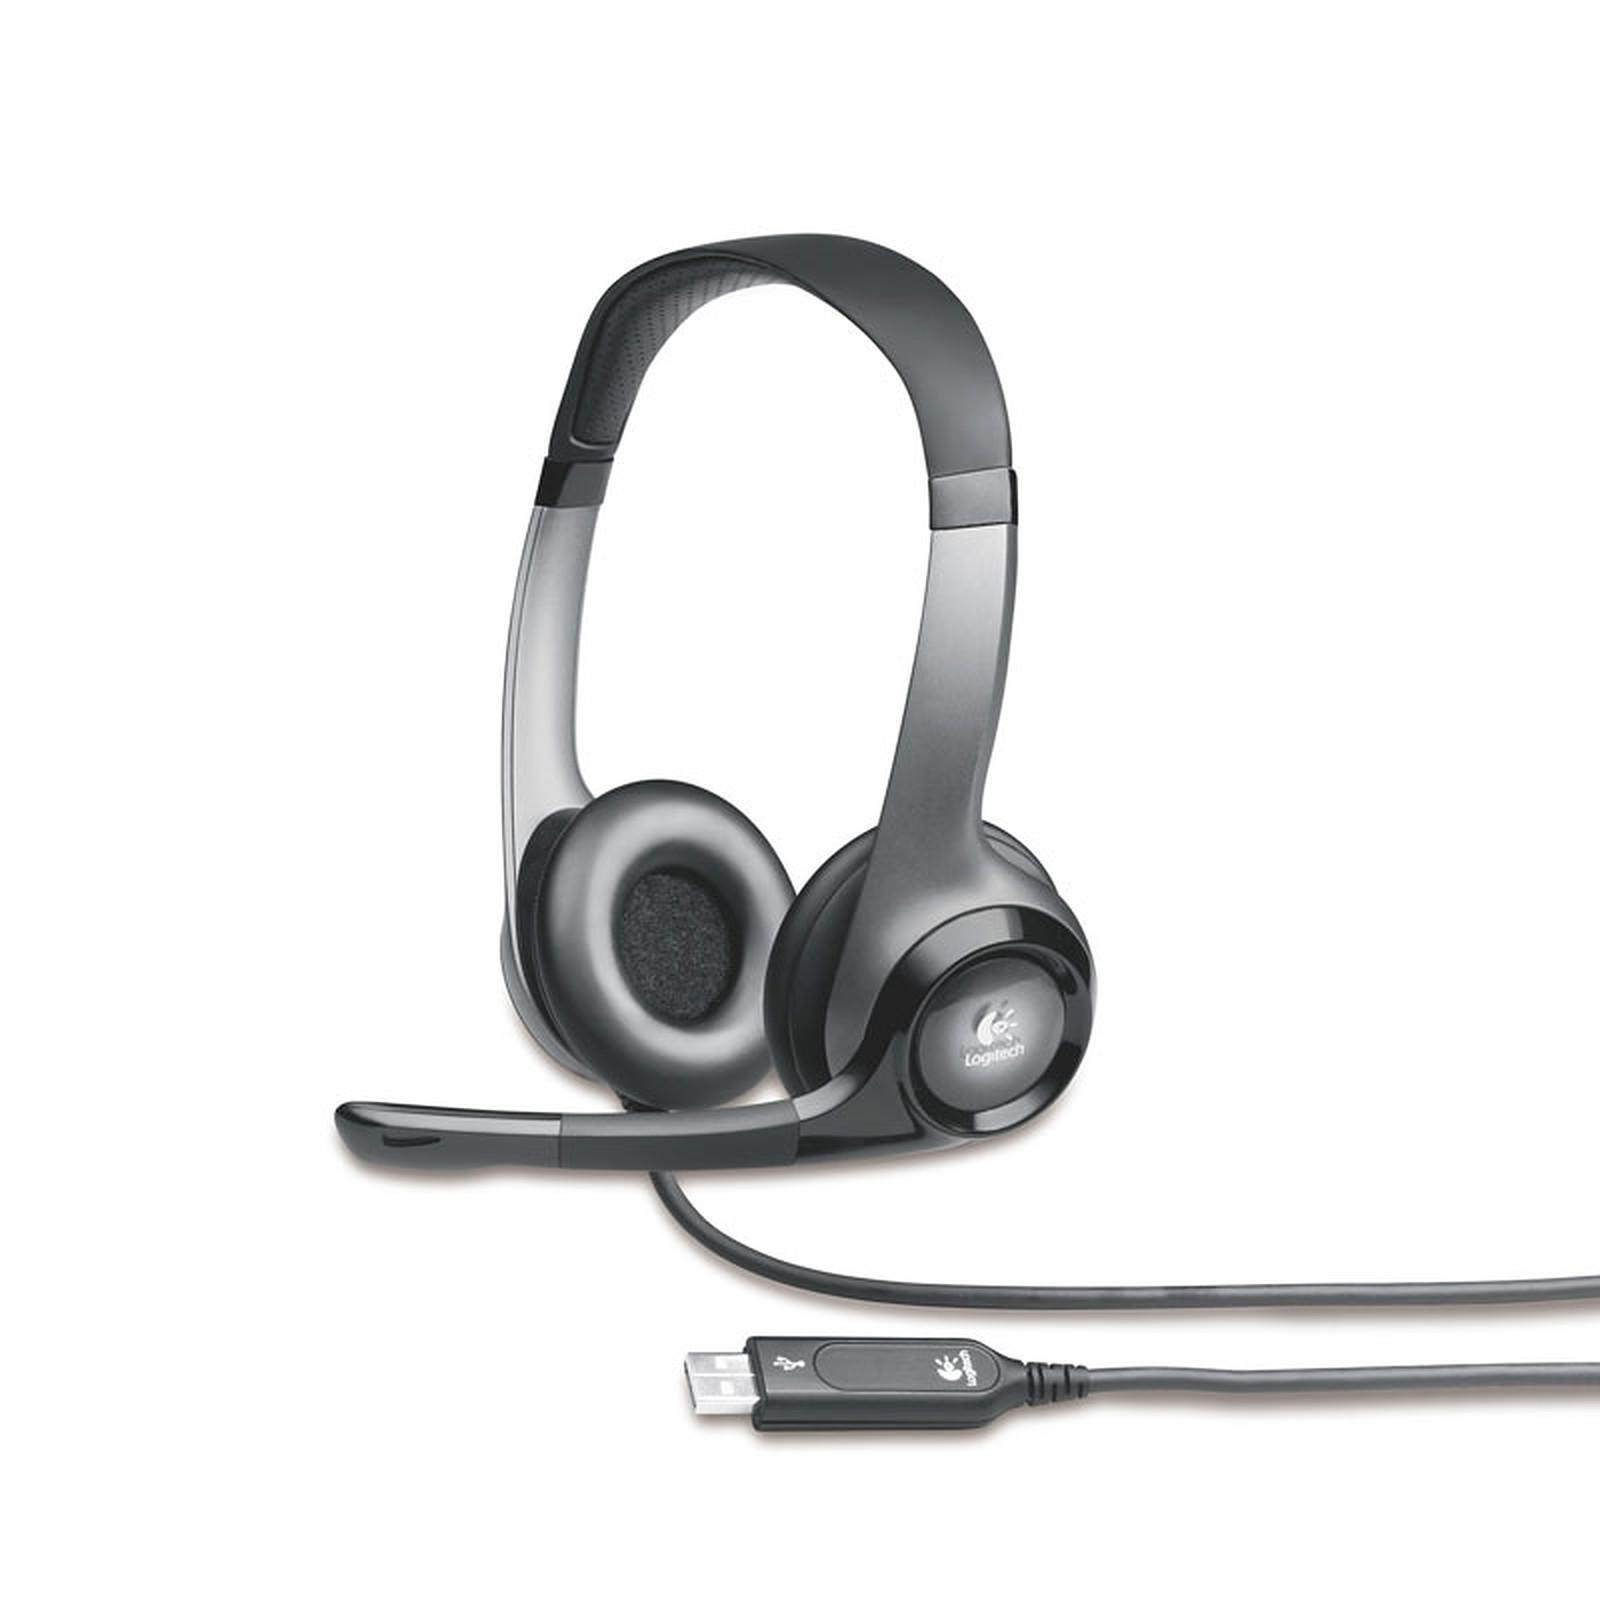 Logitech USB Headset H530